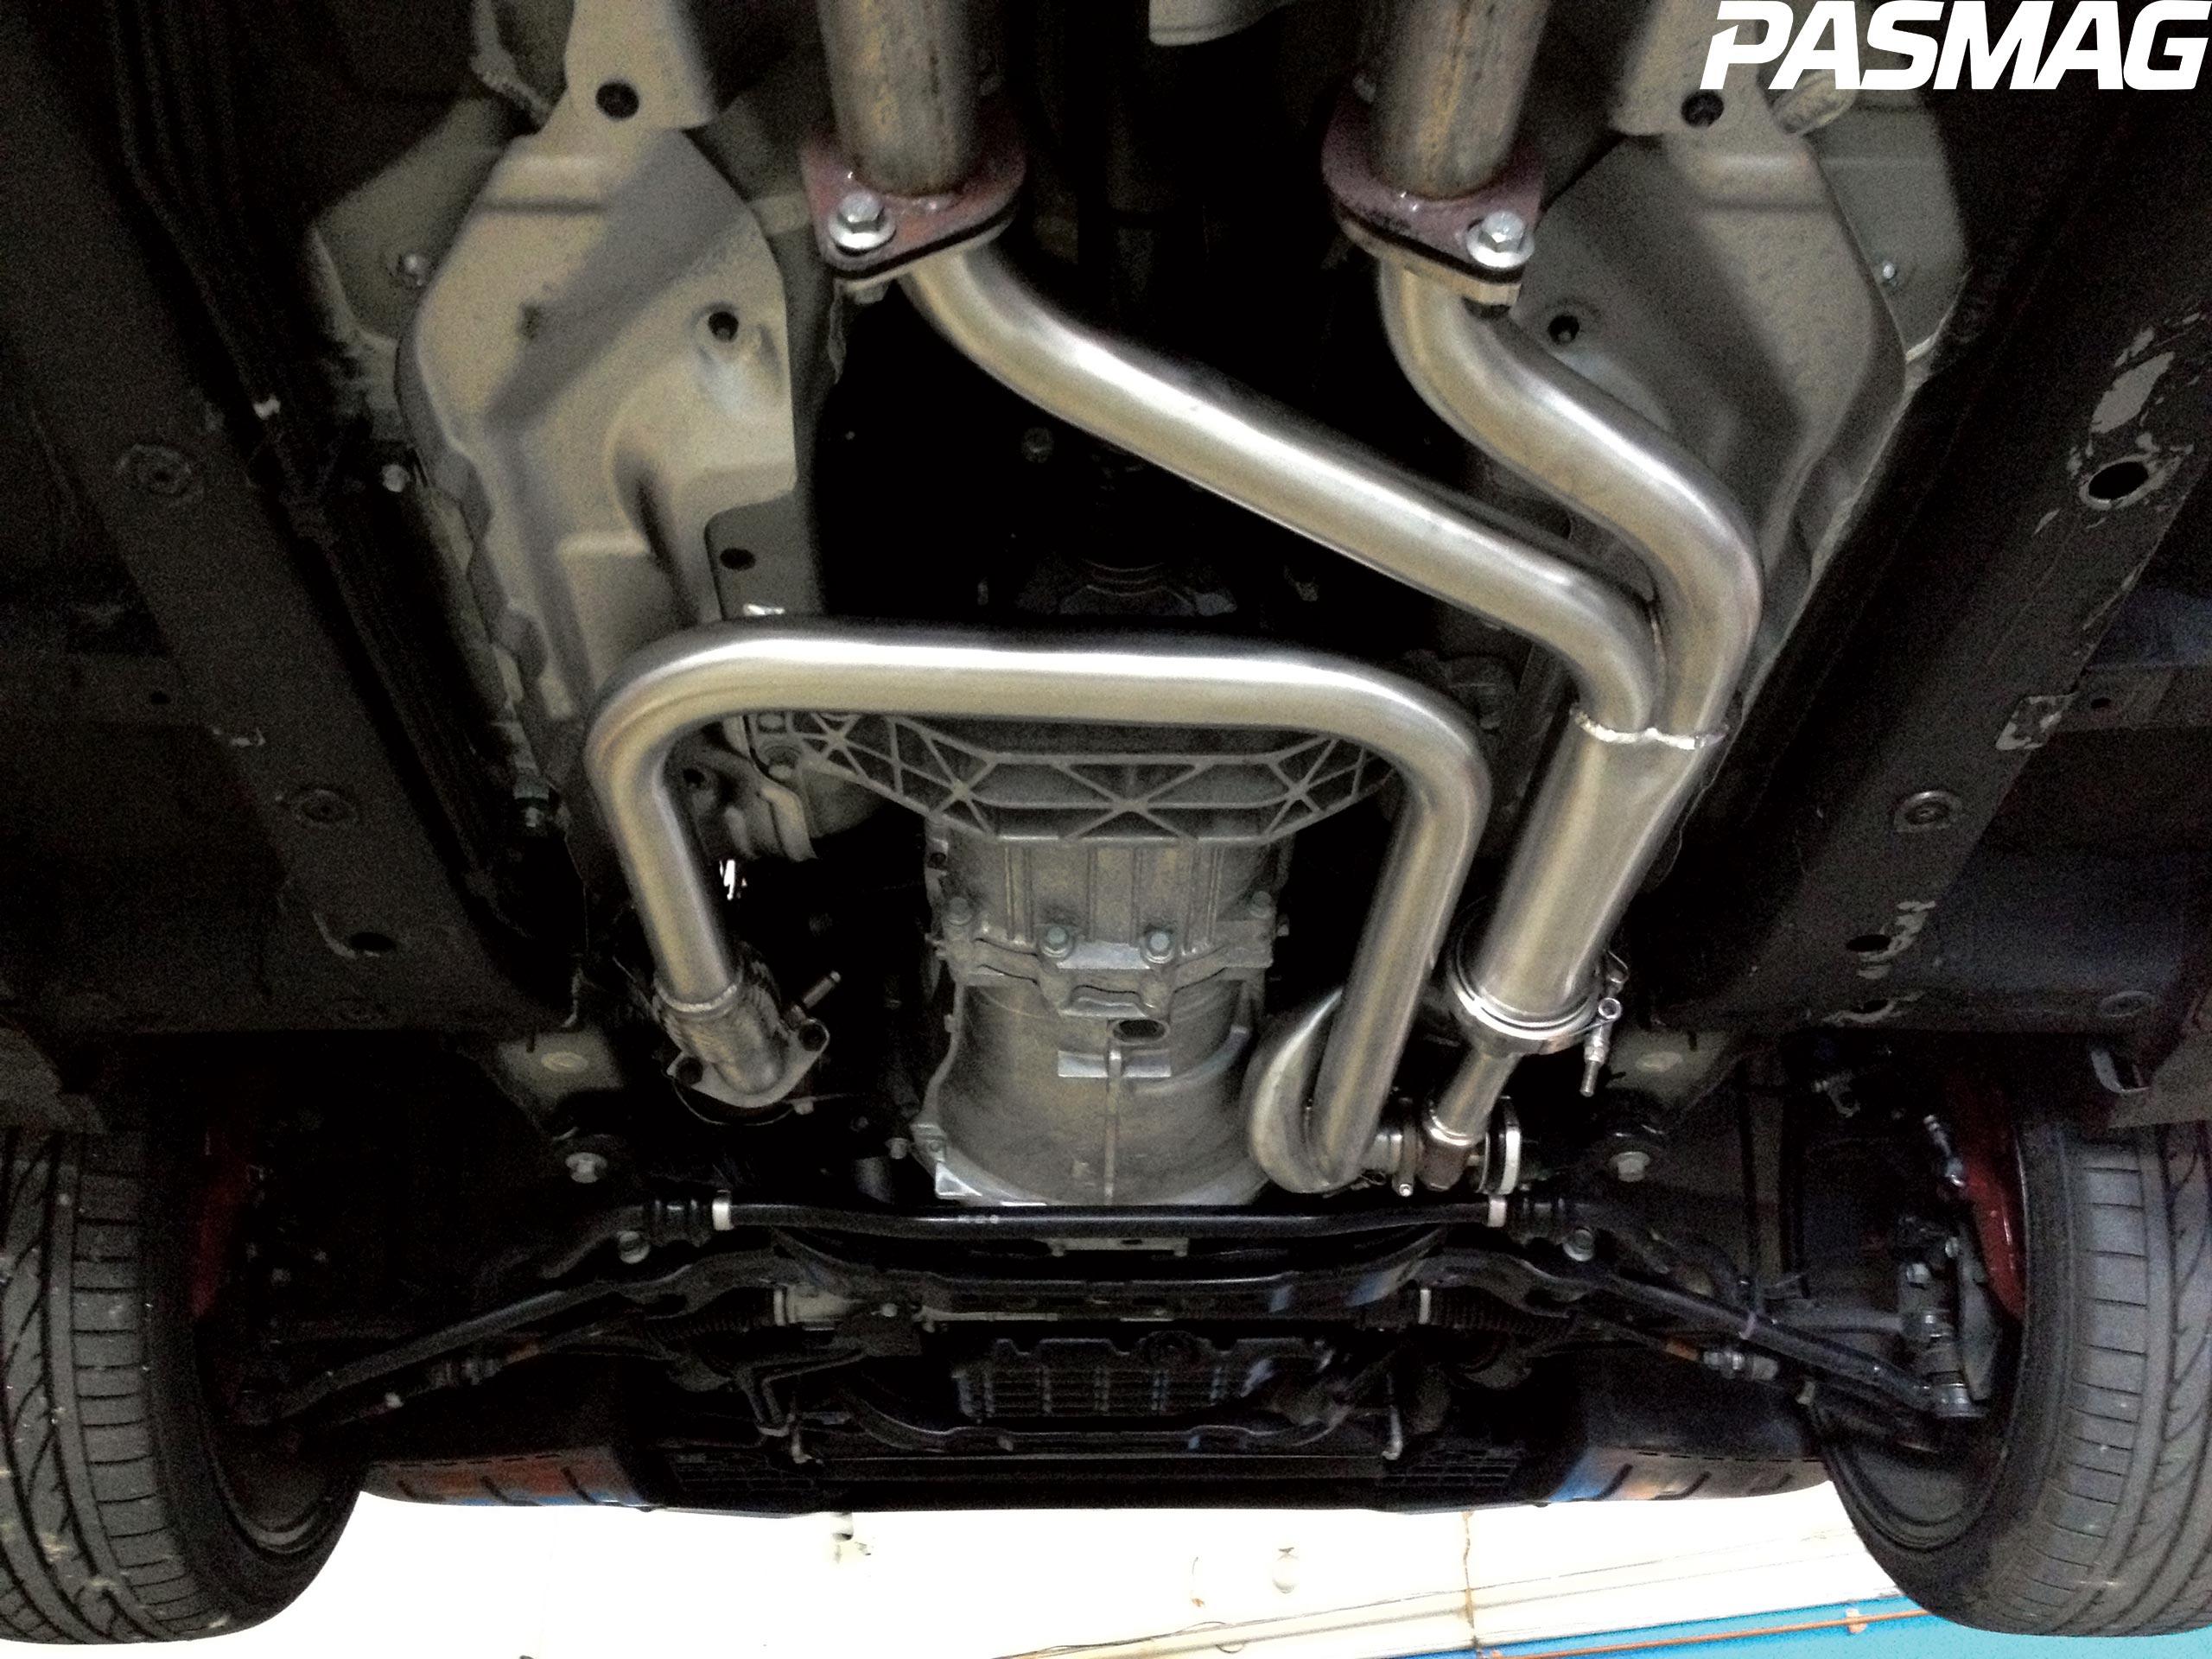 Pasmag Performance Auto And Sound Hyundai Genesis Coupe 38l Wiring Harness Turbo Kit Install